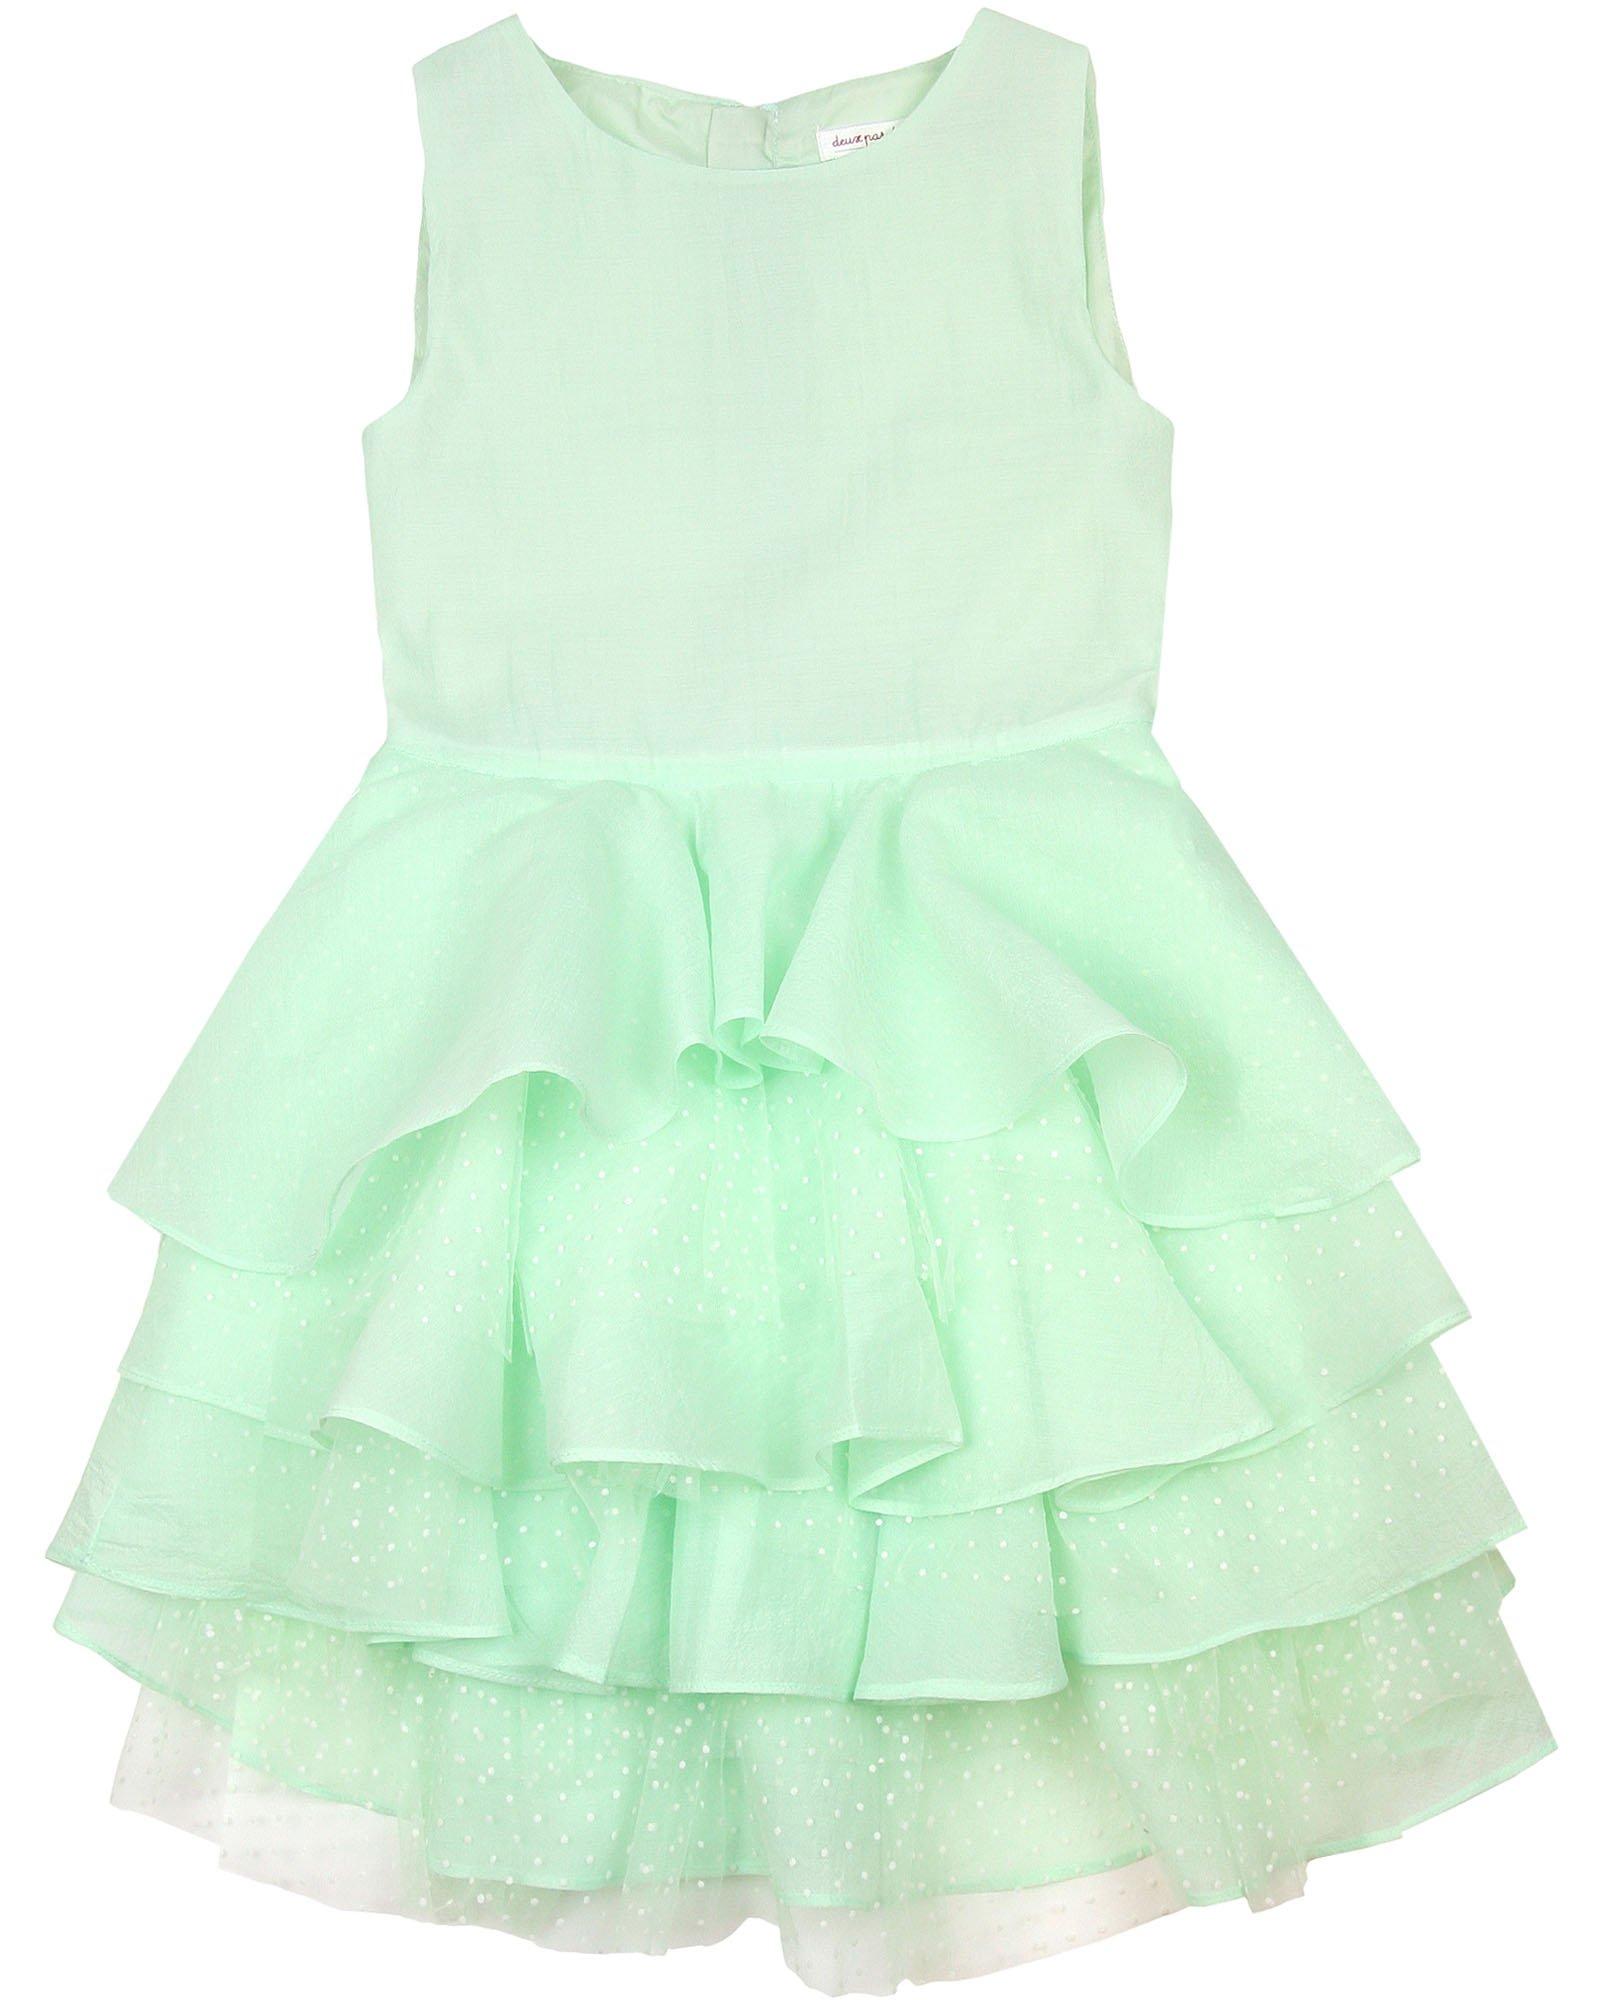 Deux par Deux Girls' Green Flounce Dress Oscar Nights, Sizes 4-12 - 10